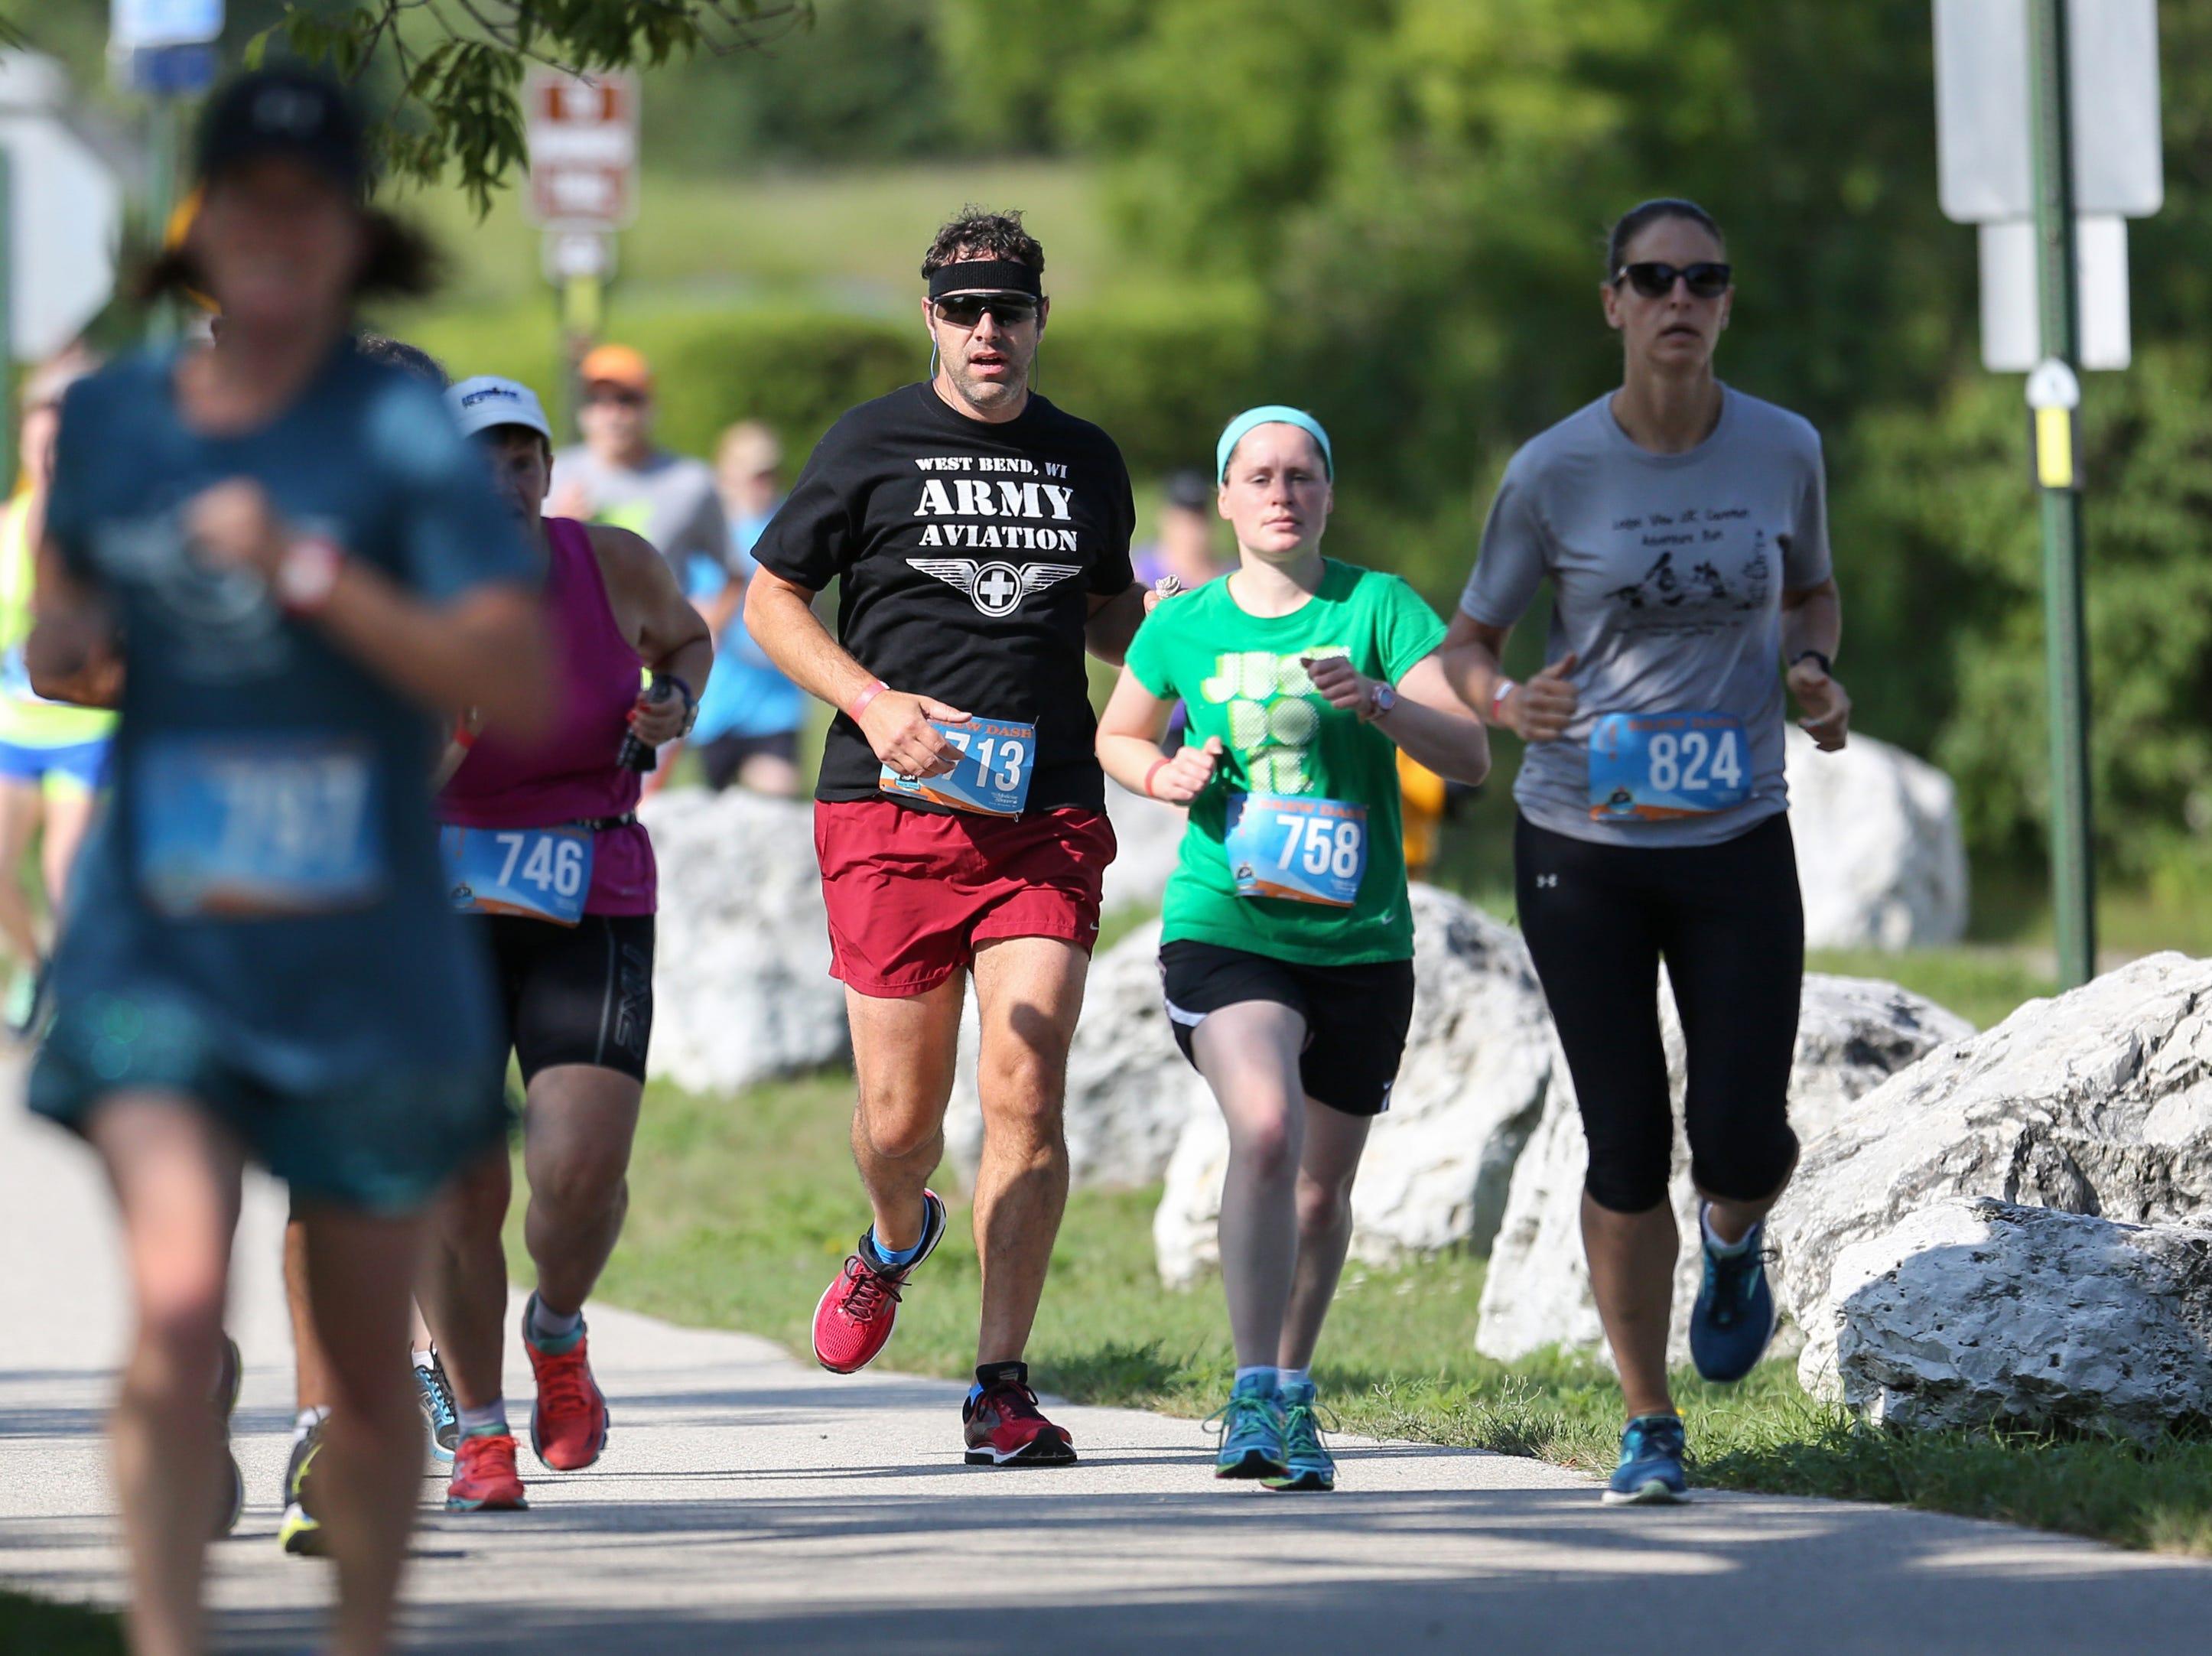 Runners cruise along Lake Michigan on Neshota Beach during the Brew Dash Saturday, July 28, 2018, in Two Rivers, Wis. Josh Clark/USA TODAY NETWORK-Wisconsin